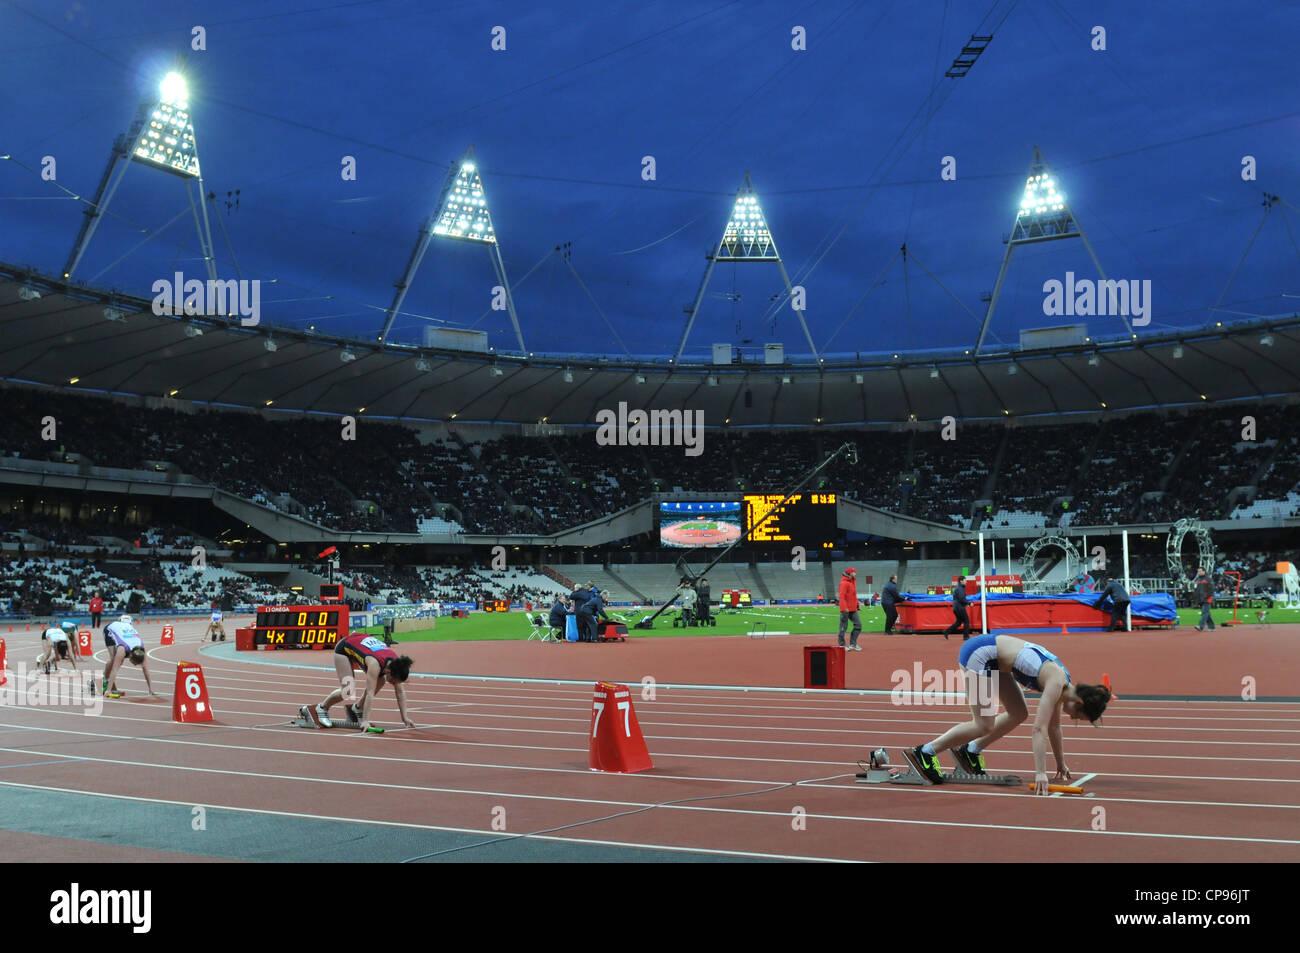 Olympic 2012 Athletics Stadium, London, UK. Womens 4 x 100 relay at the BUCS VISA Outdoor Athletics Championships. - Stock Image